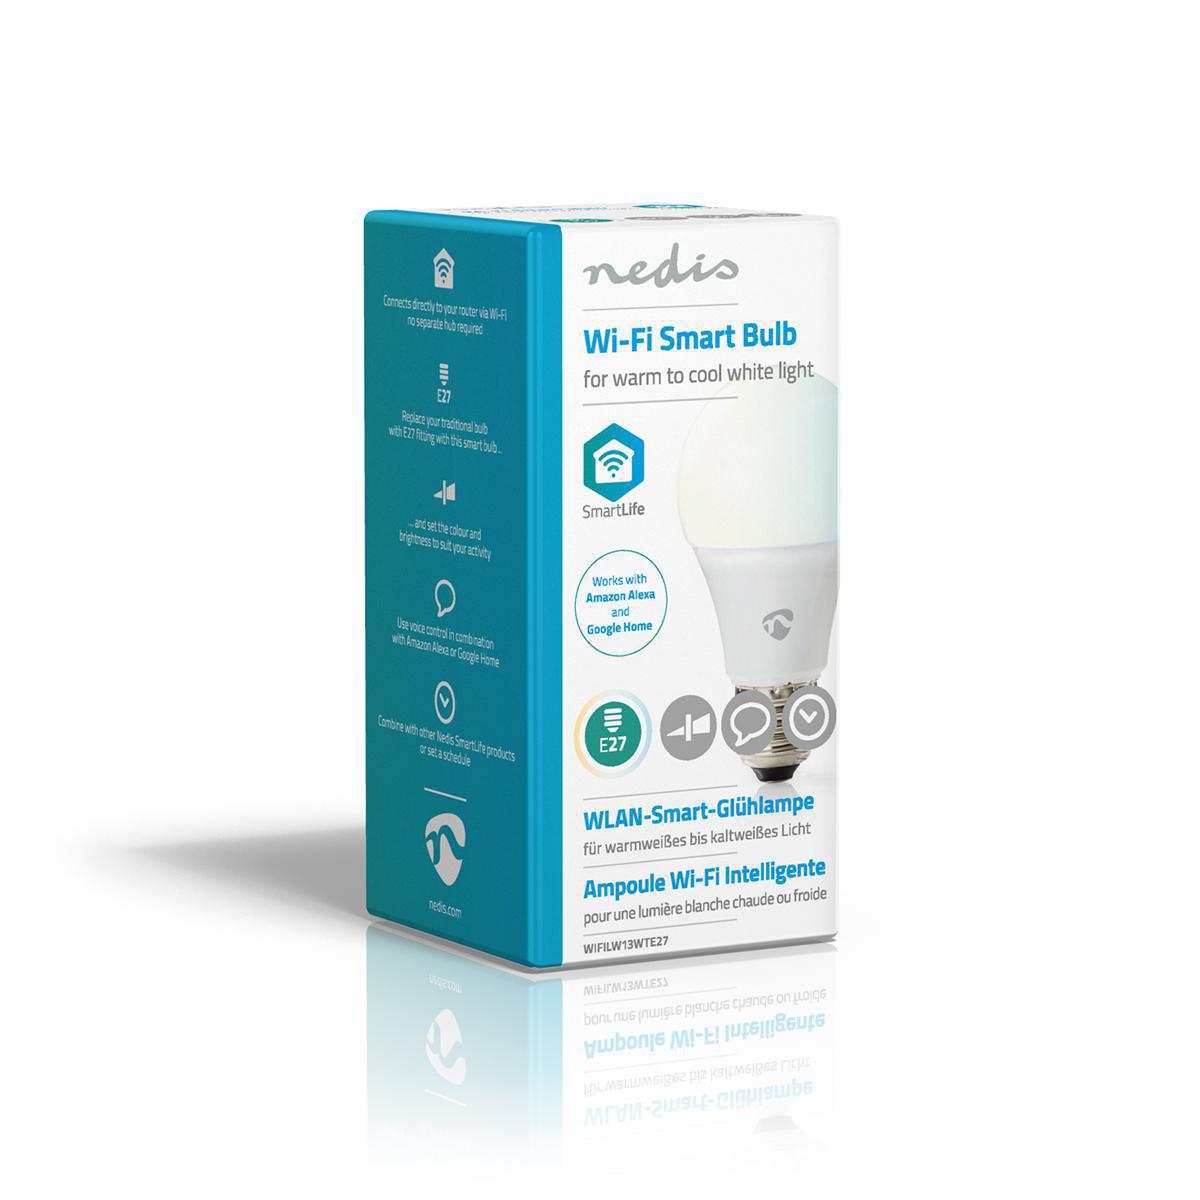 Slimme Wi-Fi Led Lamp 9 Watt CCT - Kleurwissel - zijaanzicht verpakking